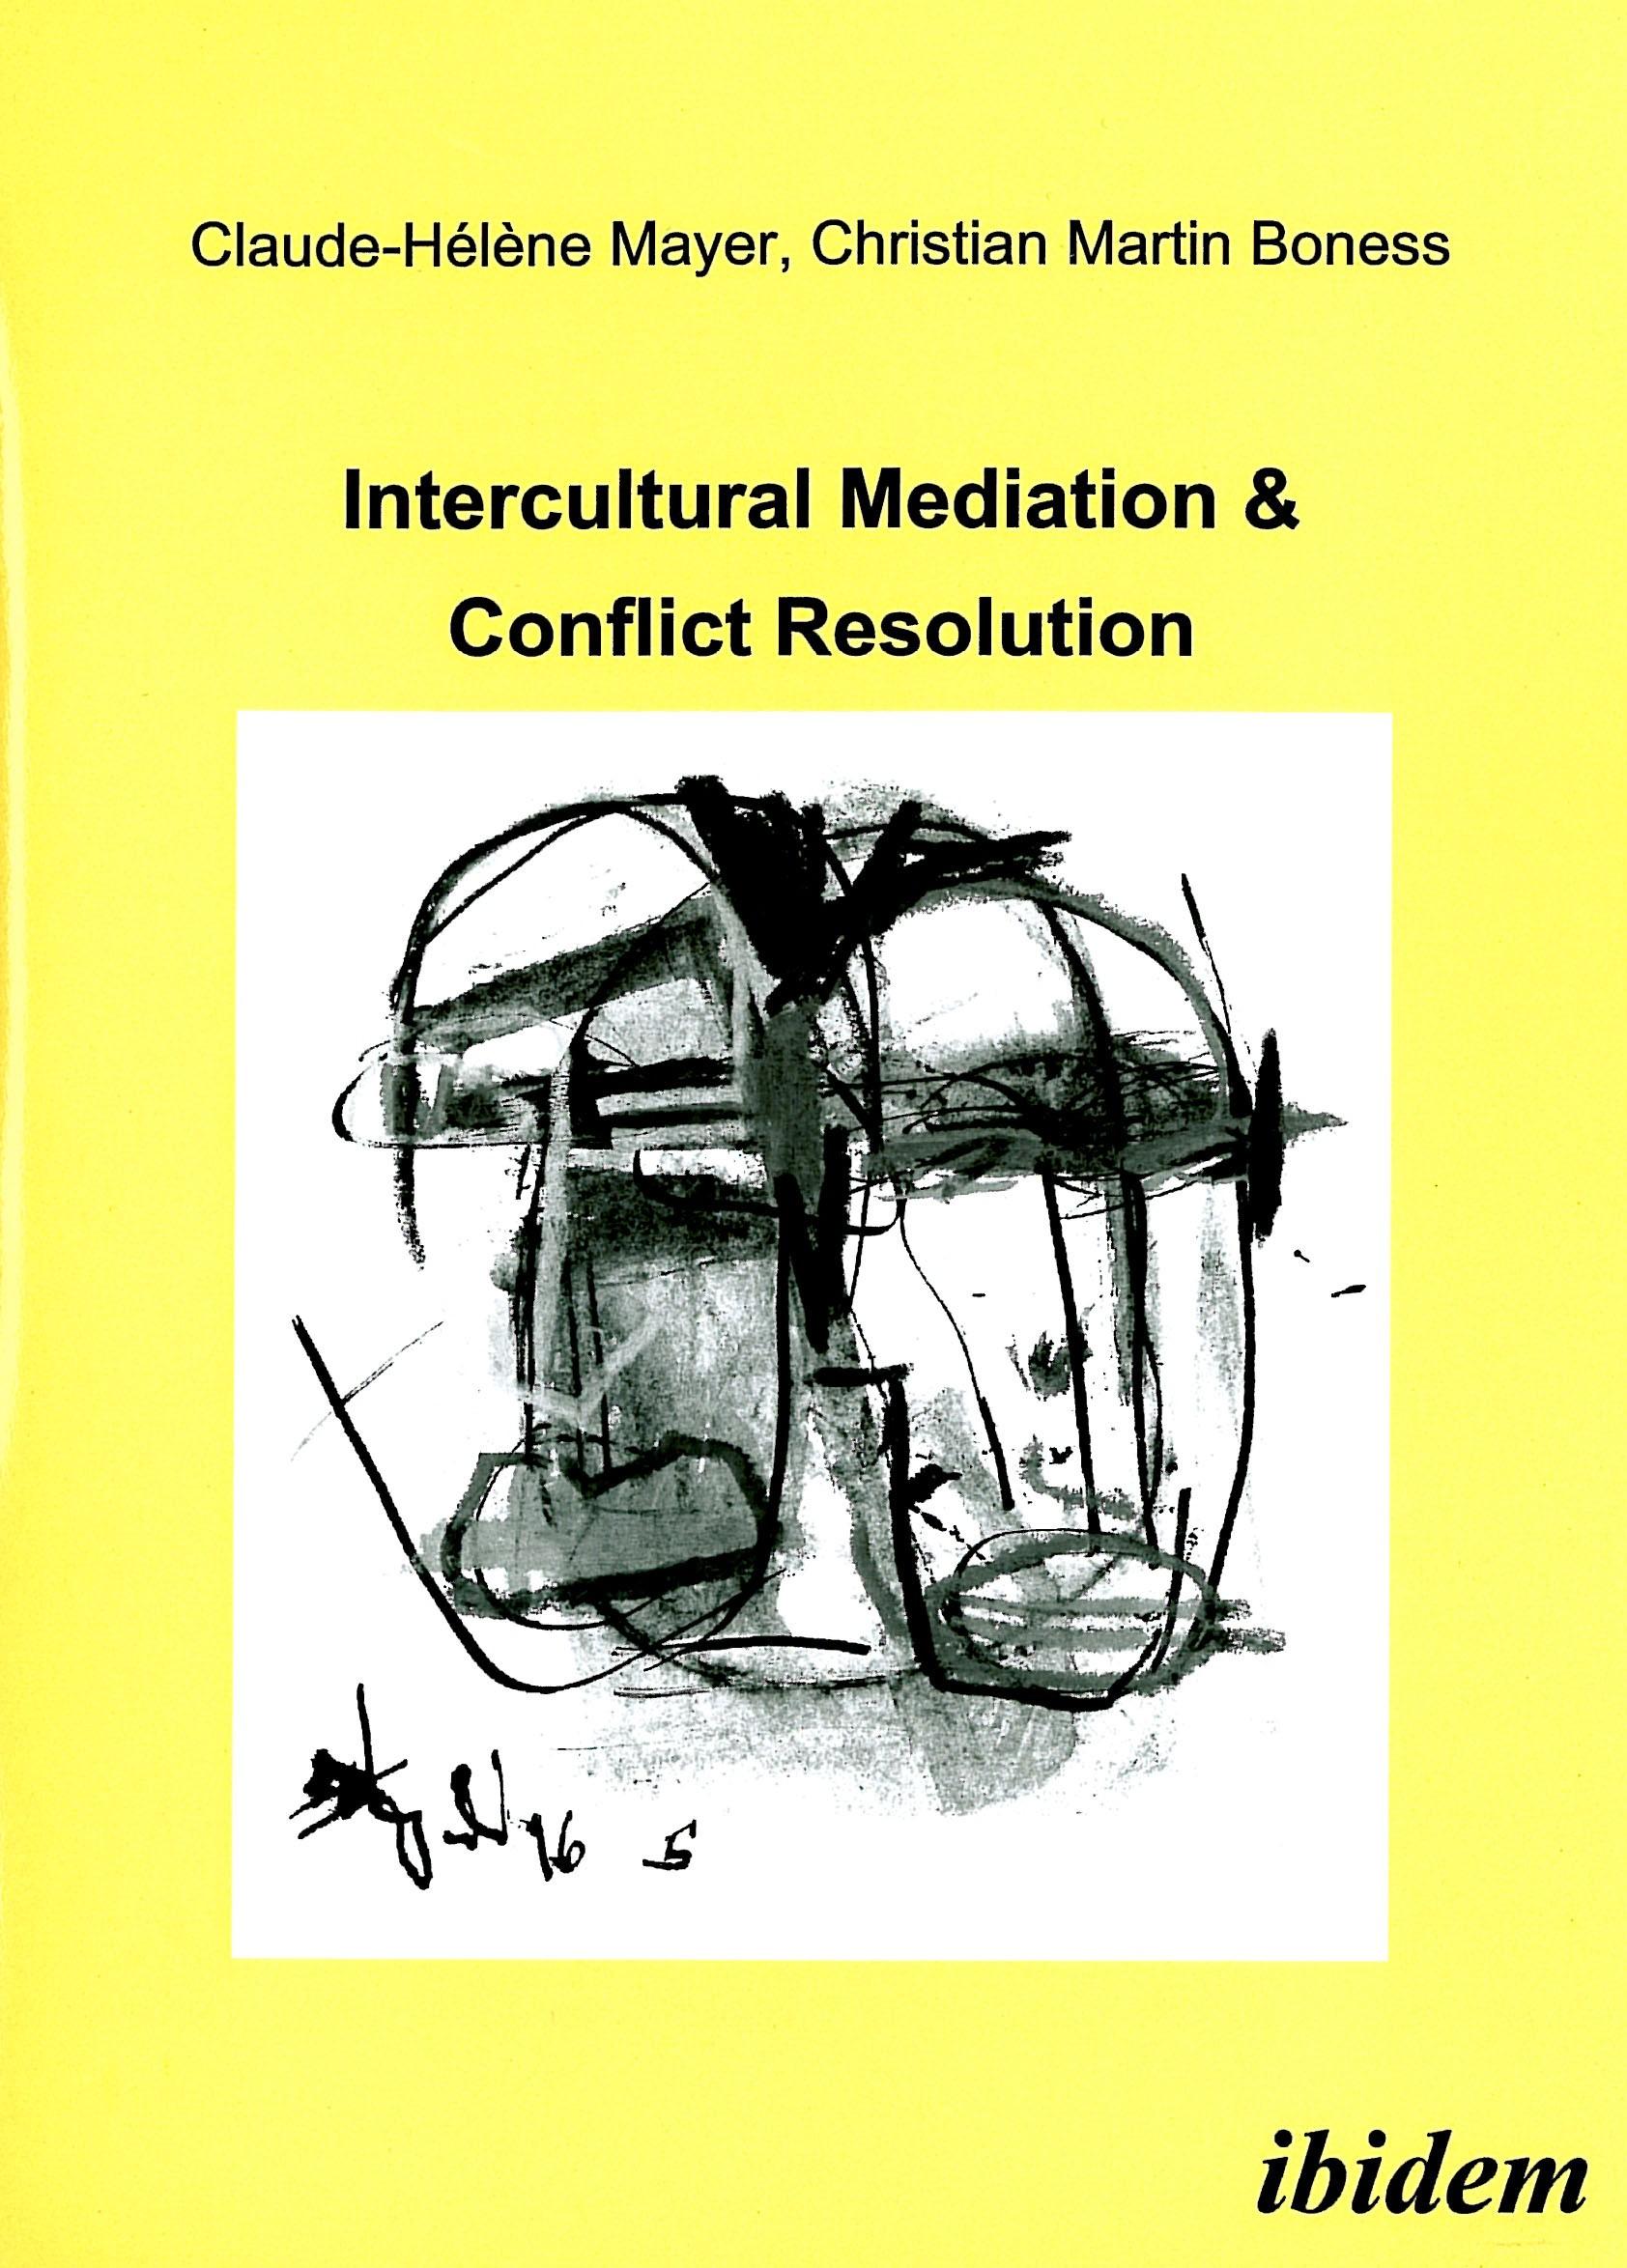 Intercultural Mediation & Conflict Resolution